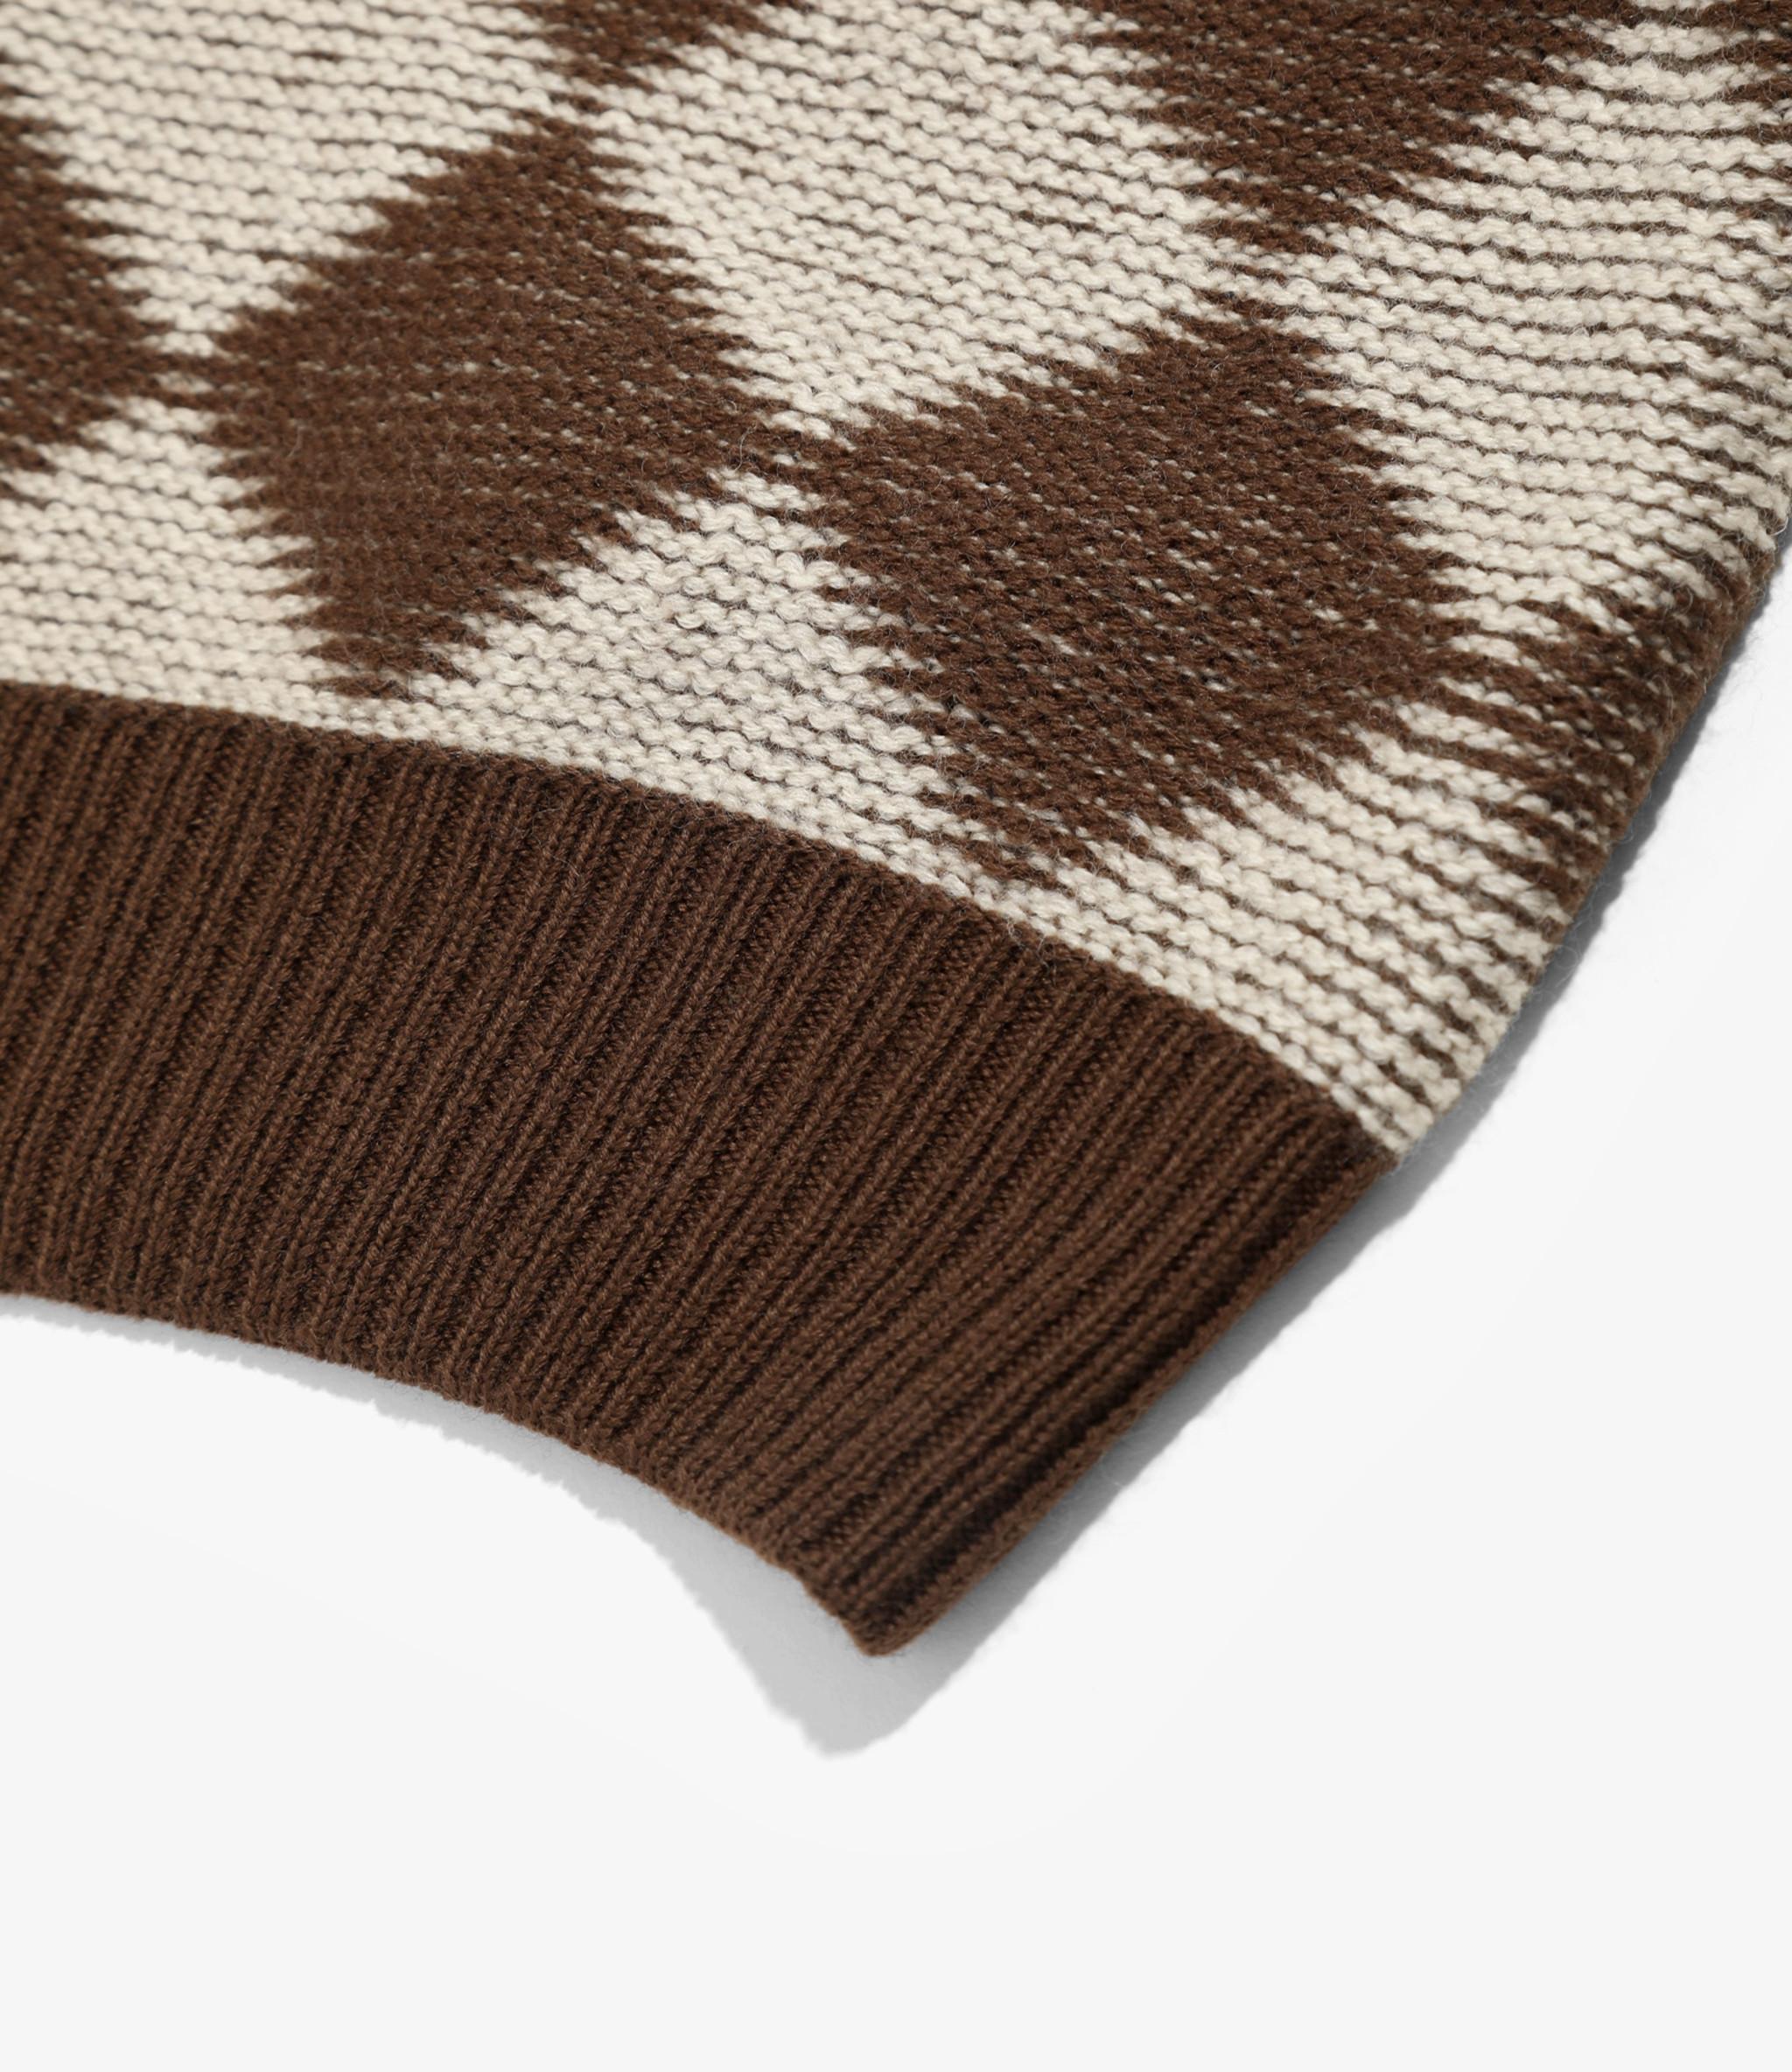 Needles Polo Sweater - Checkered - Dark Brown